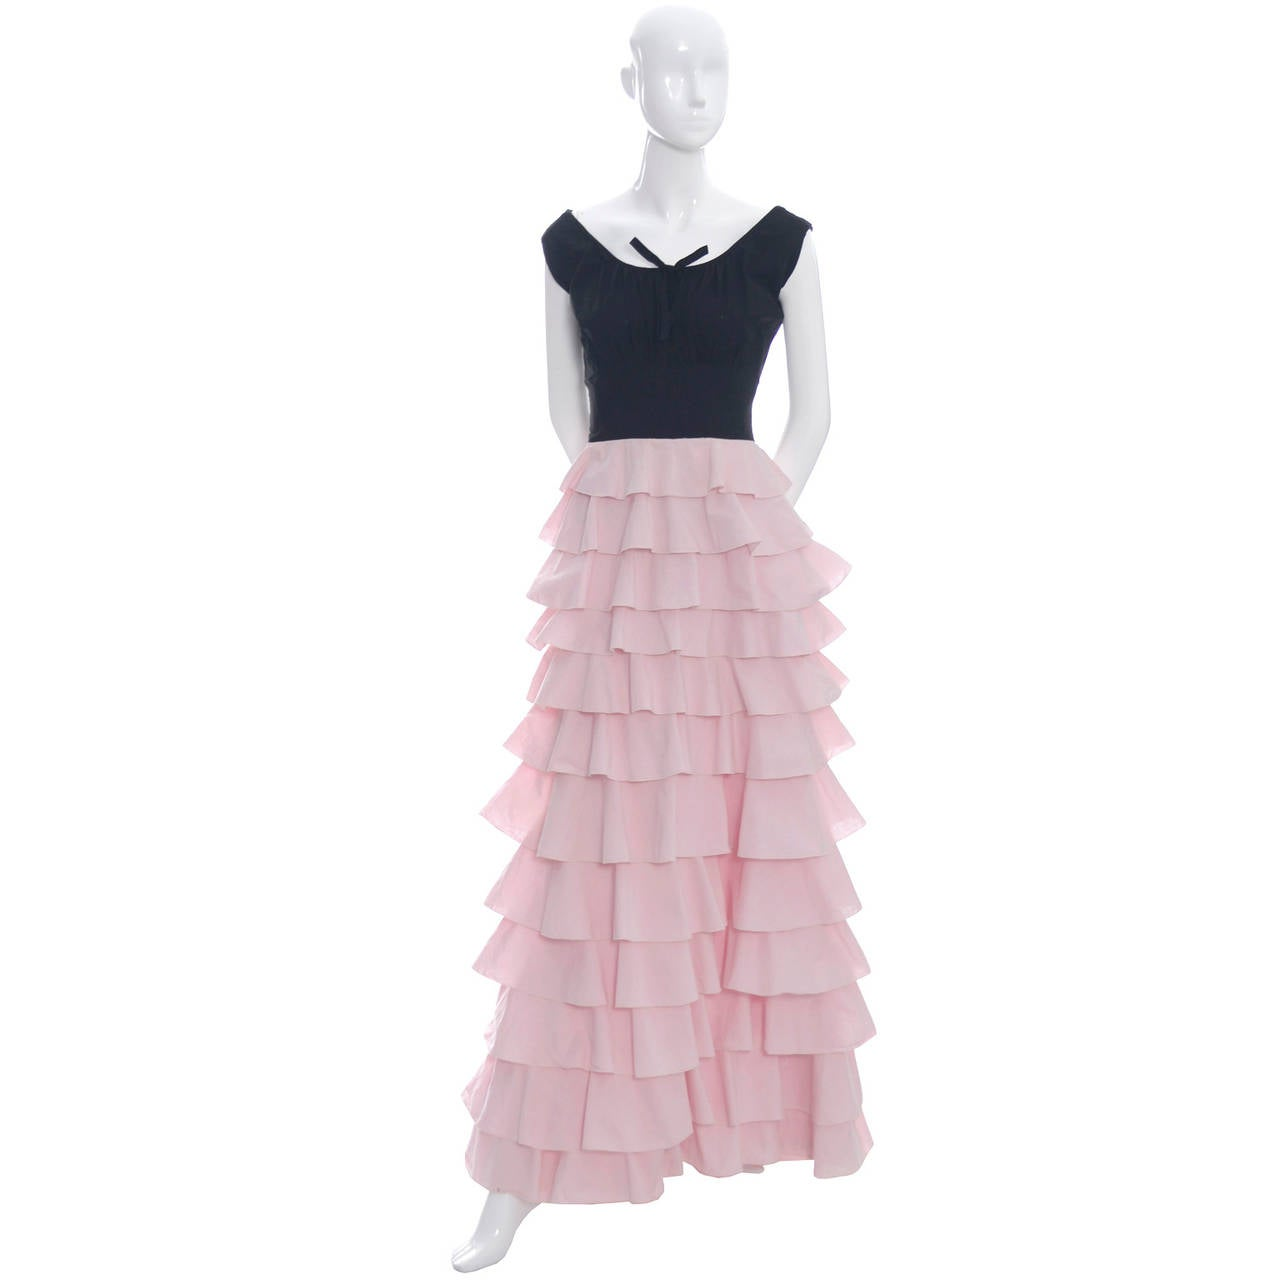 Beige 1940s Vintage Gilbert Adrian Original Dress Pink Ruffles Rare Designer Gown For Sale